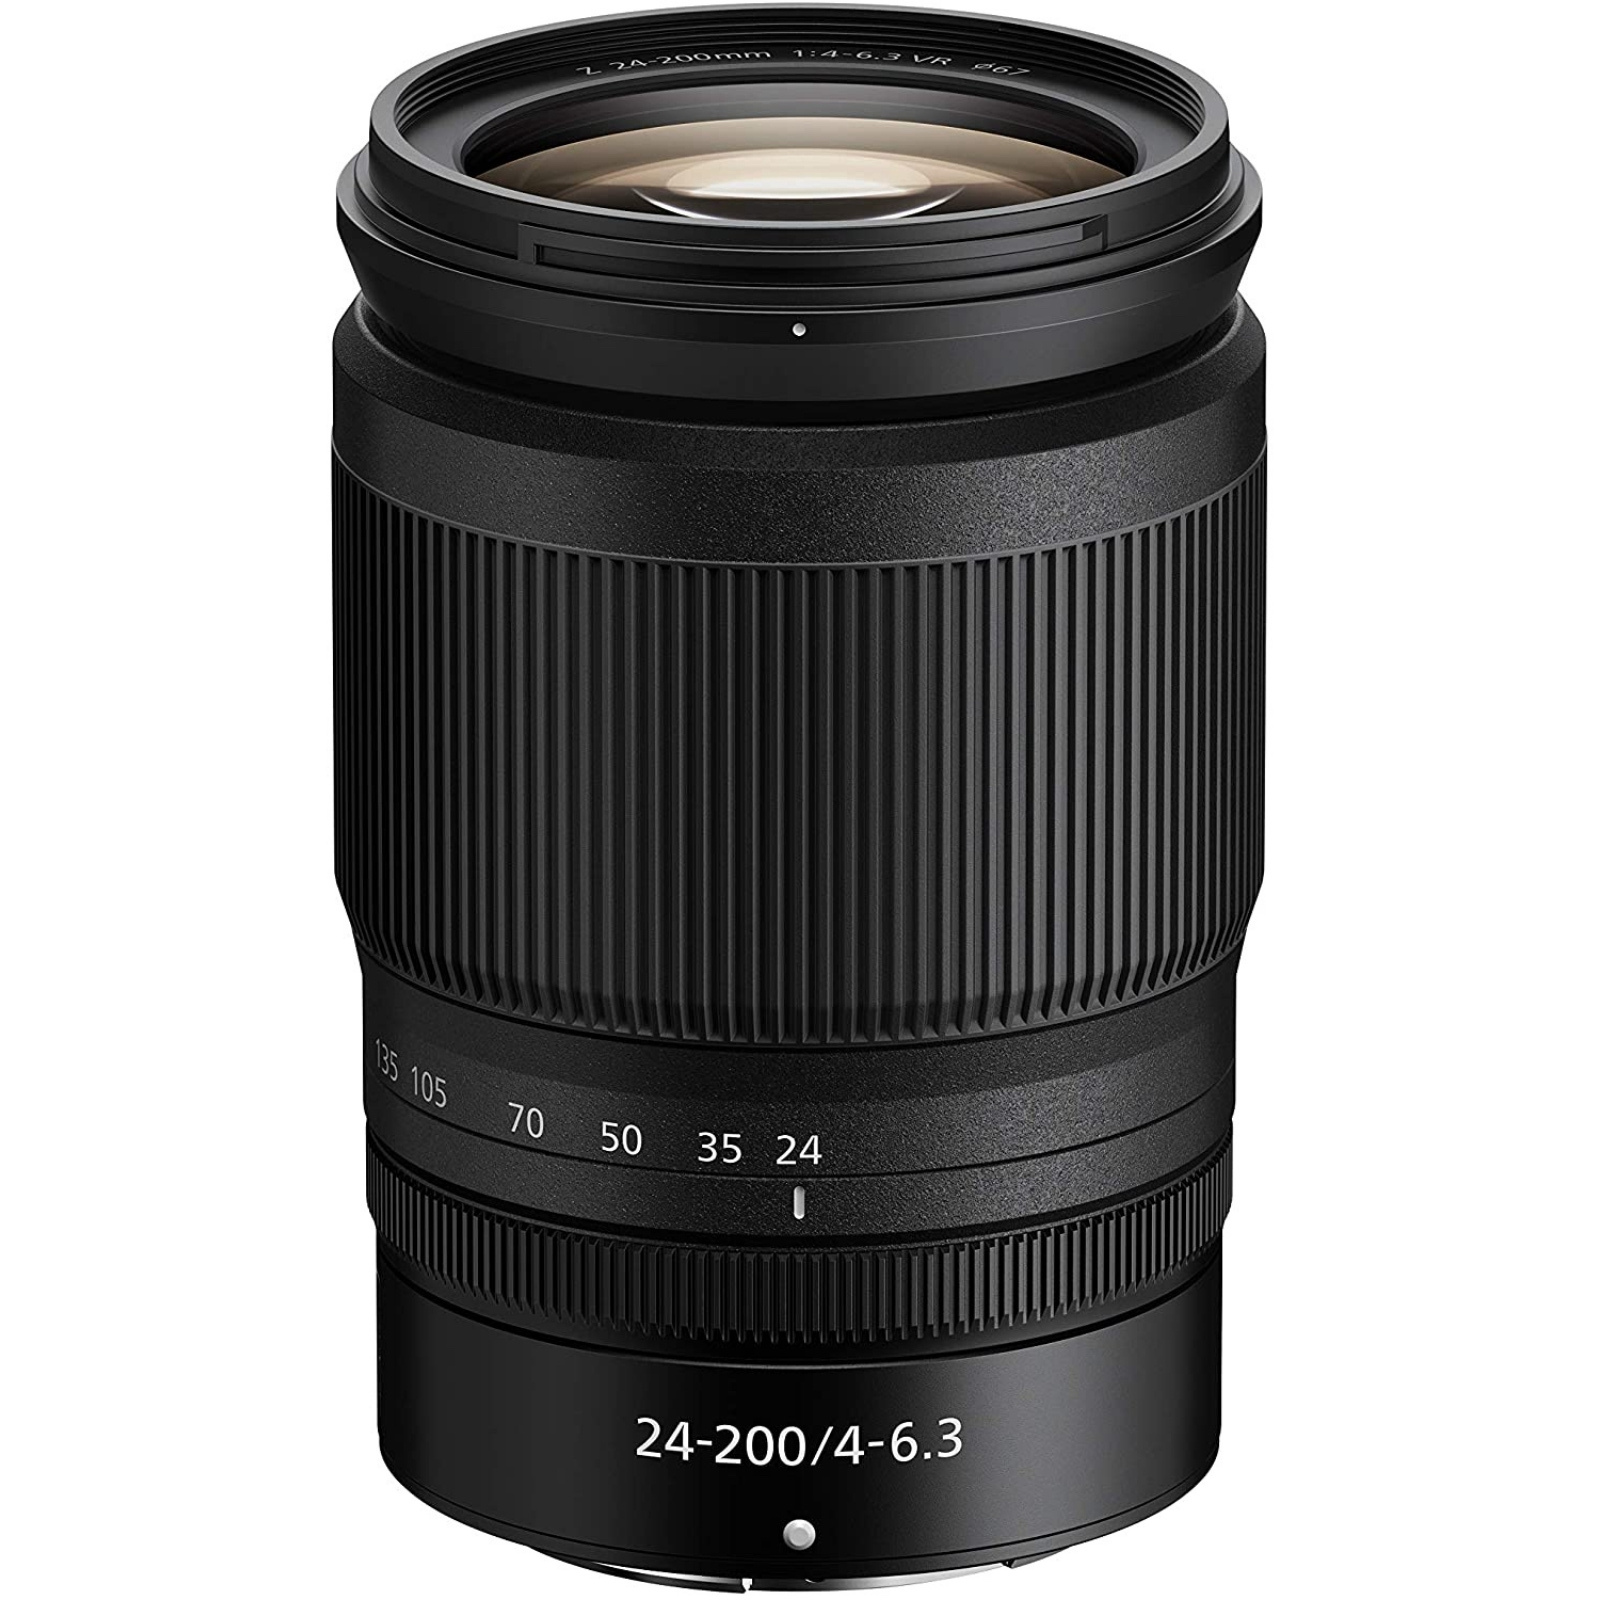 Nikon ニコン 高倍率ズームレンズ NIKKOR Z 24-200mm f/4-6.3 VRブラック 新品 (簡易箱)